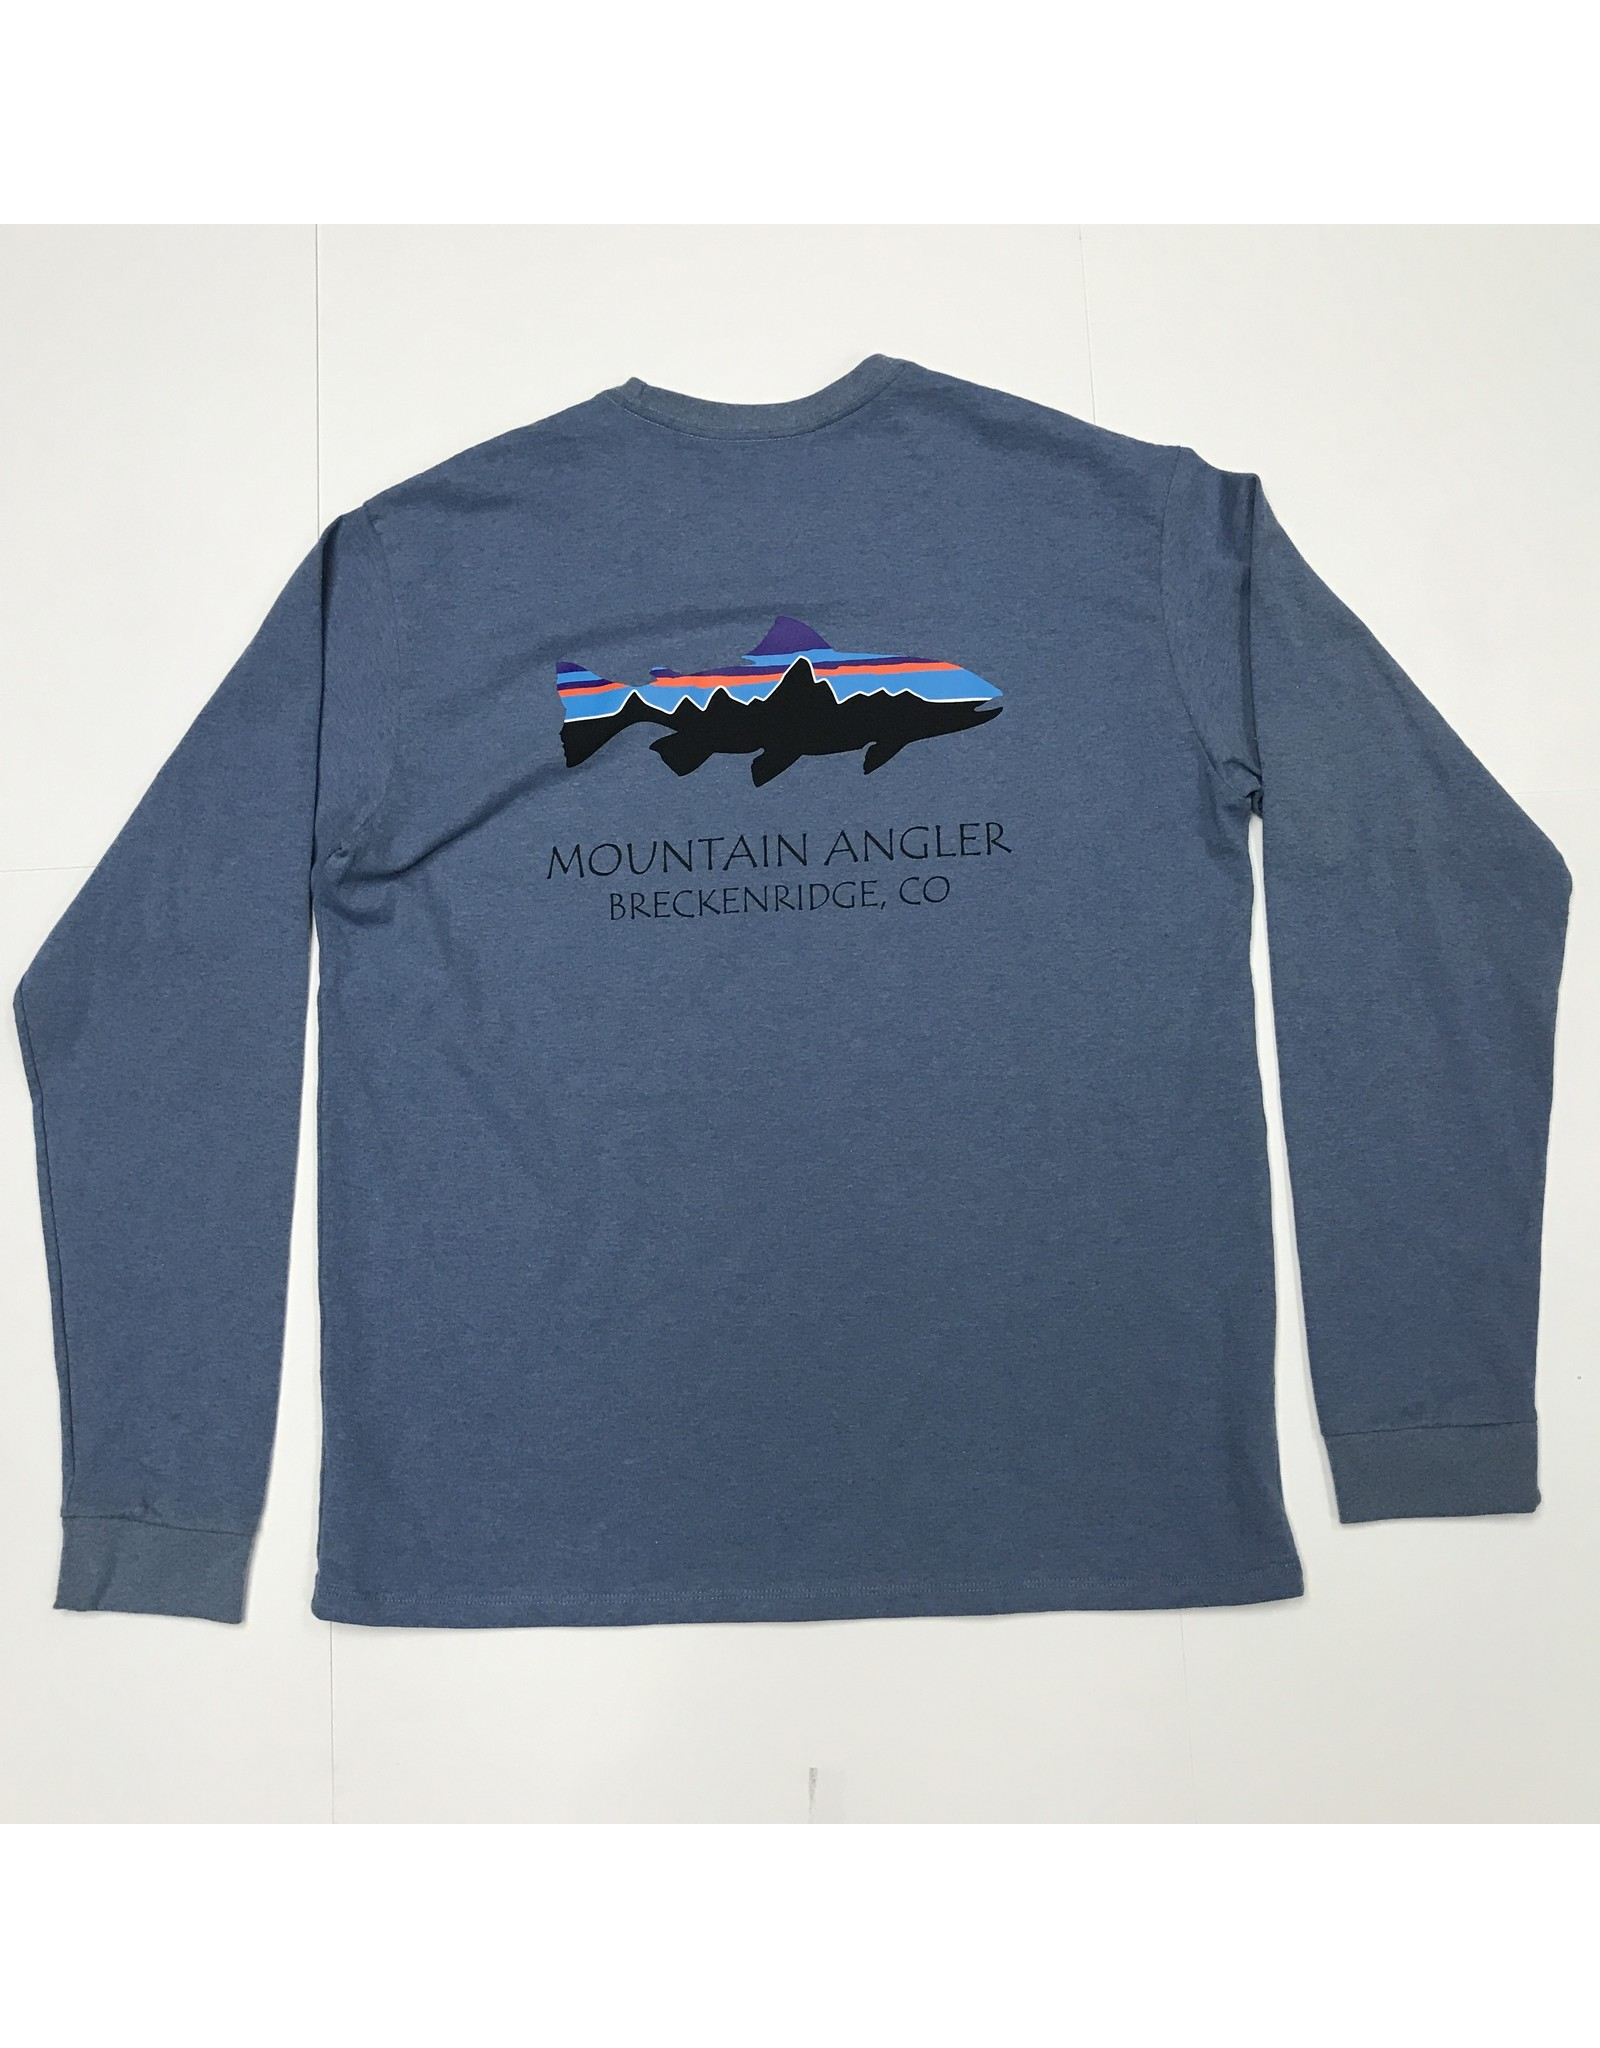 Patagonia Patagonia - Men's L/S Fitz Roy Trout MT ANGLER LOGO Responsibili-Tee